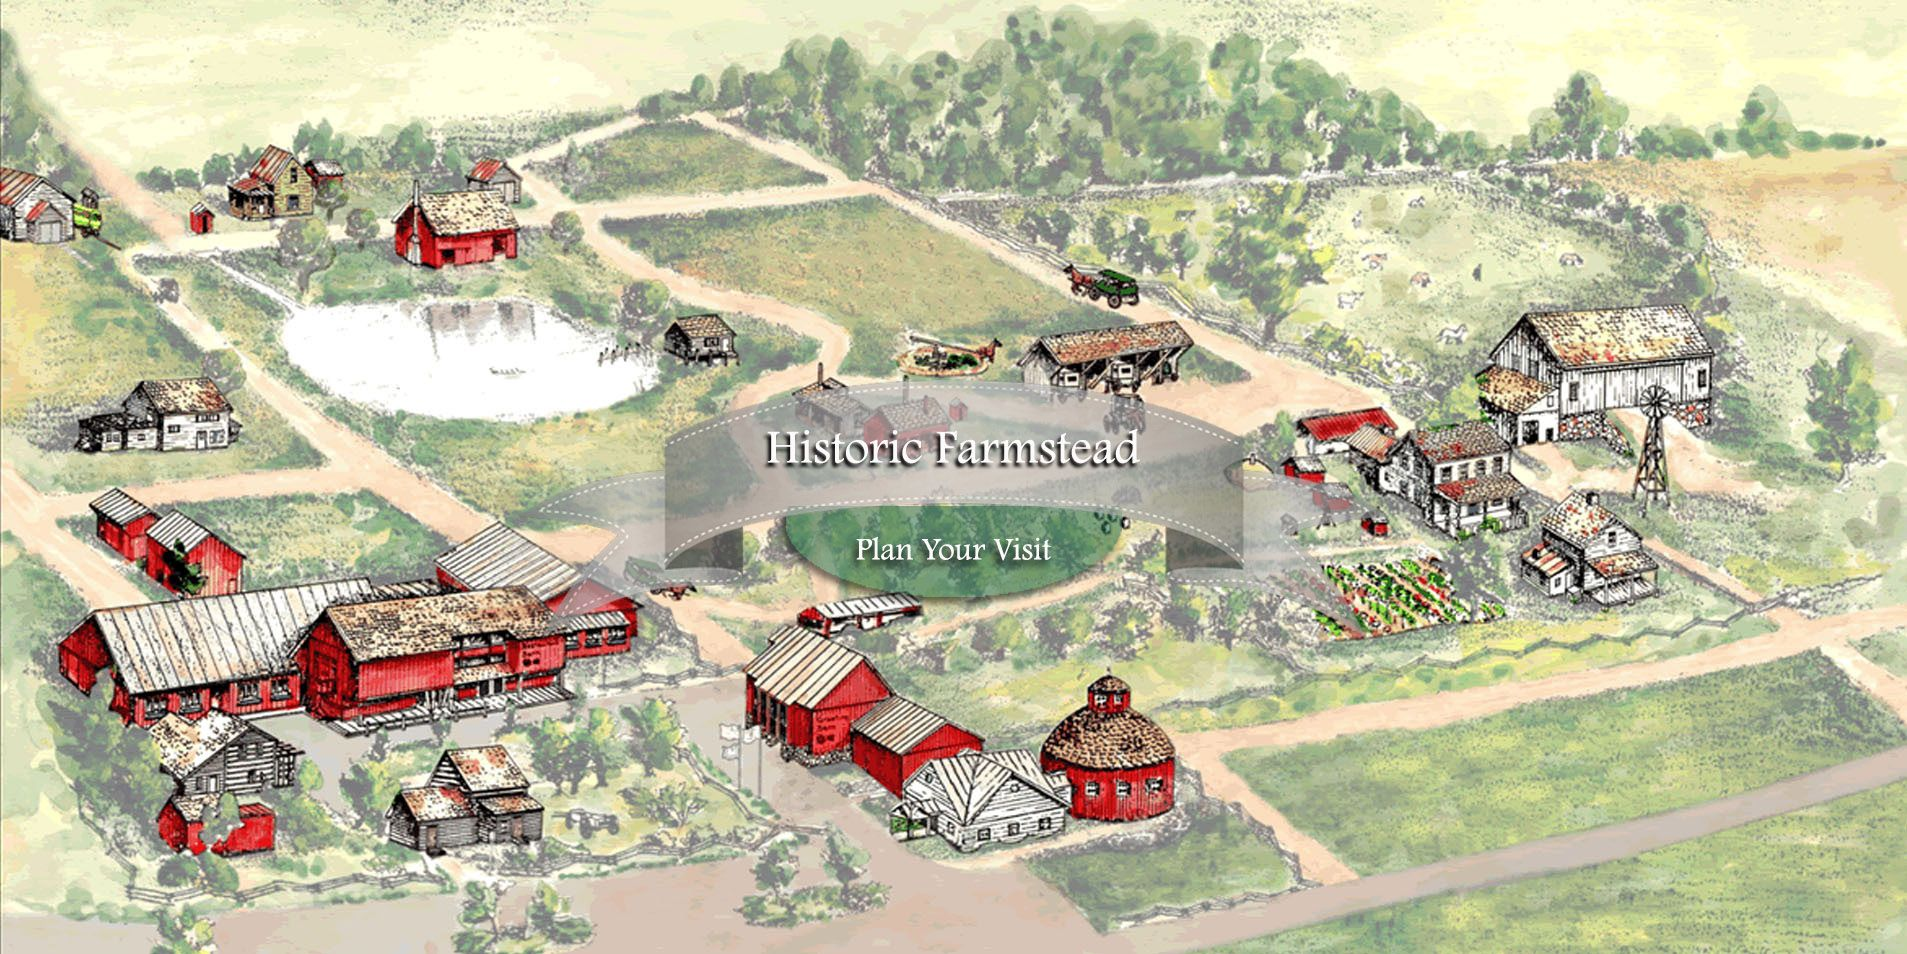 Amish Acres Historic Farm Amish Acres Amish Farm Us Road Trip Backyard greenhouse nashville indiana